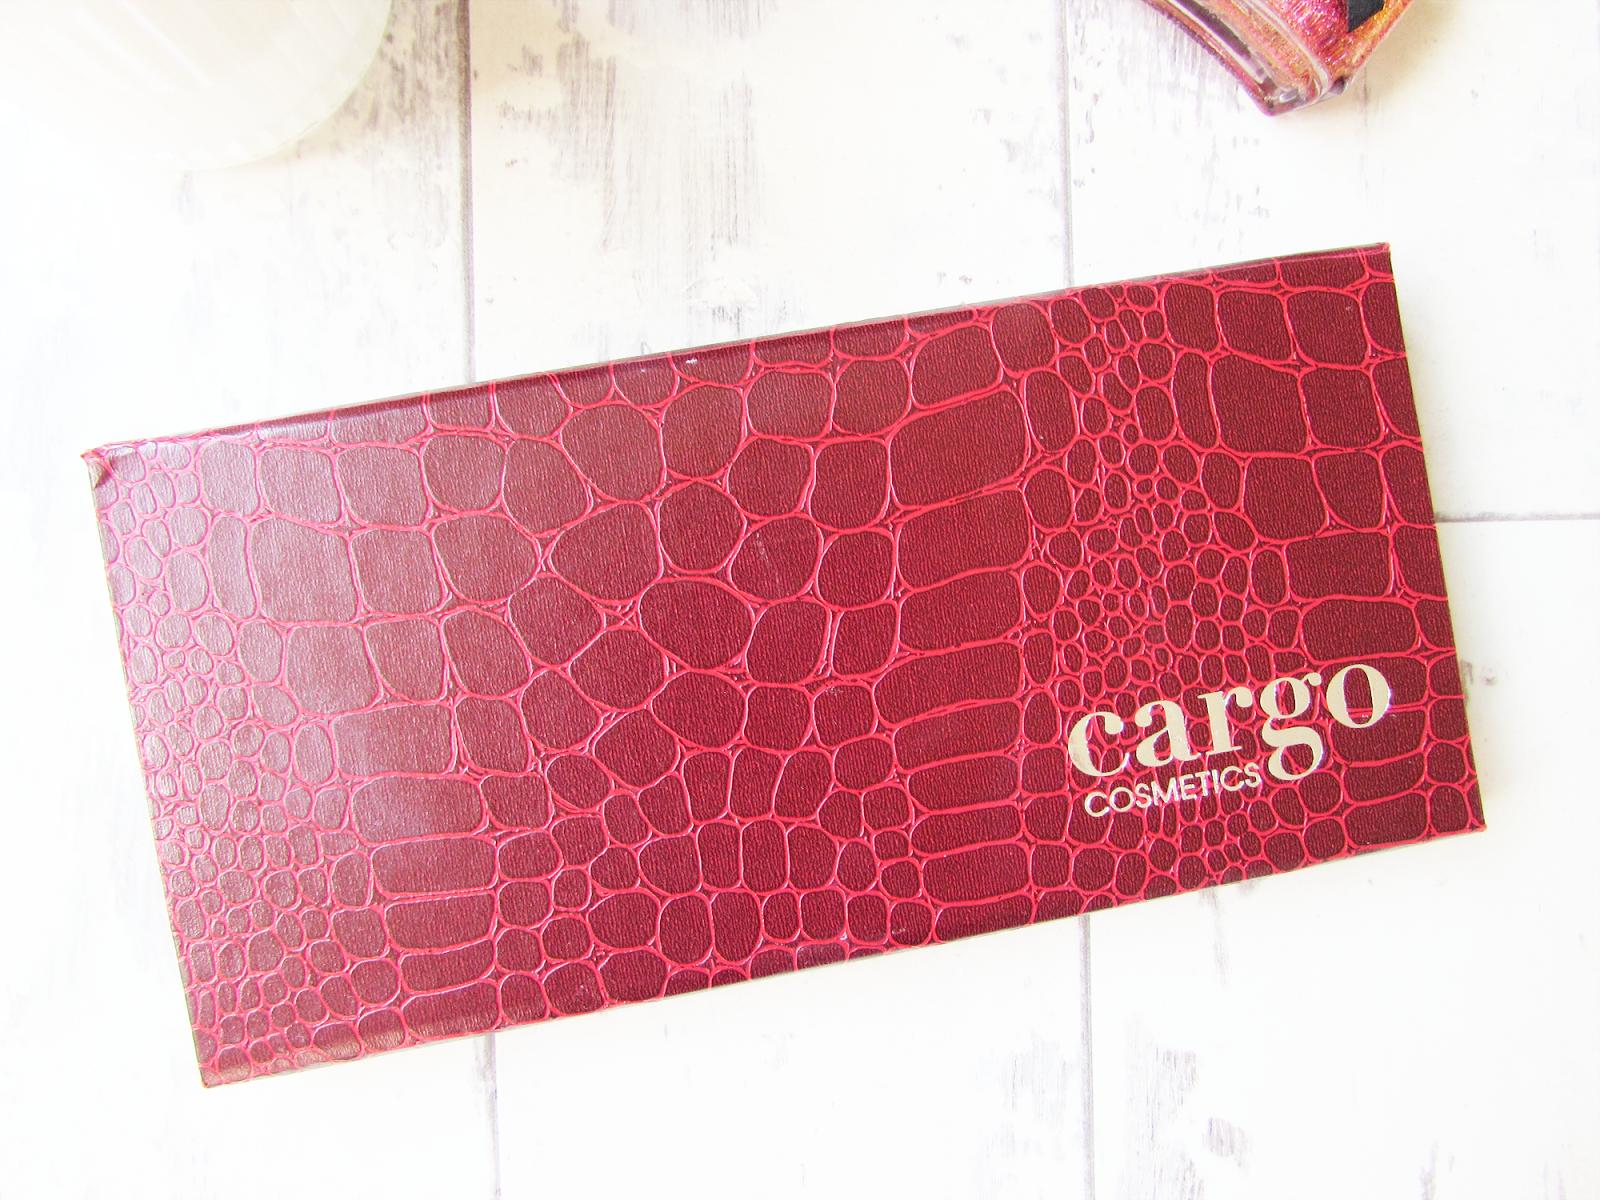 Cargo Cosmetics Northern Lights Eyeshadow Palette